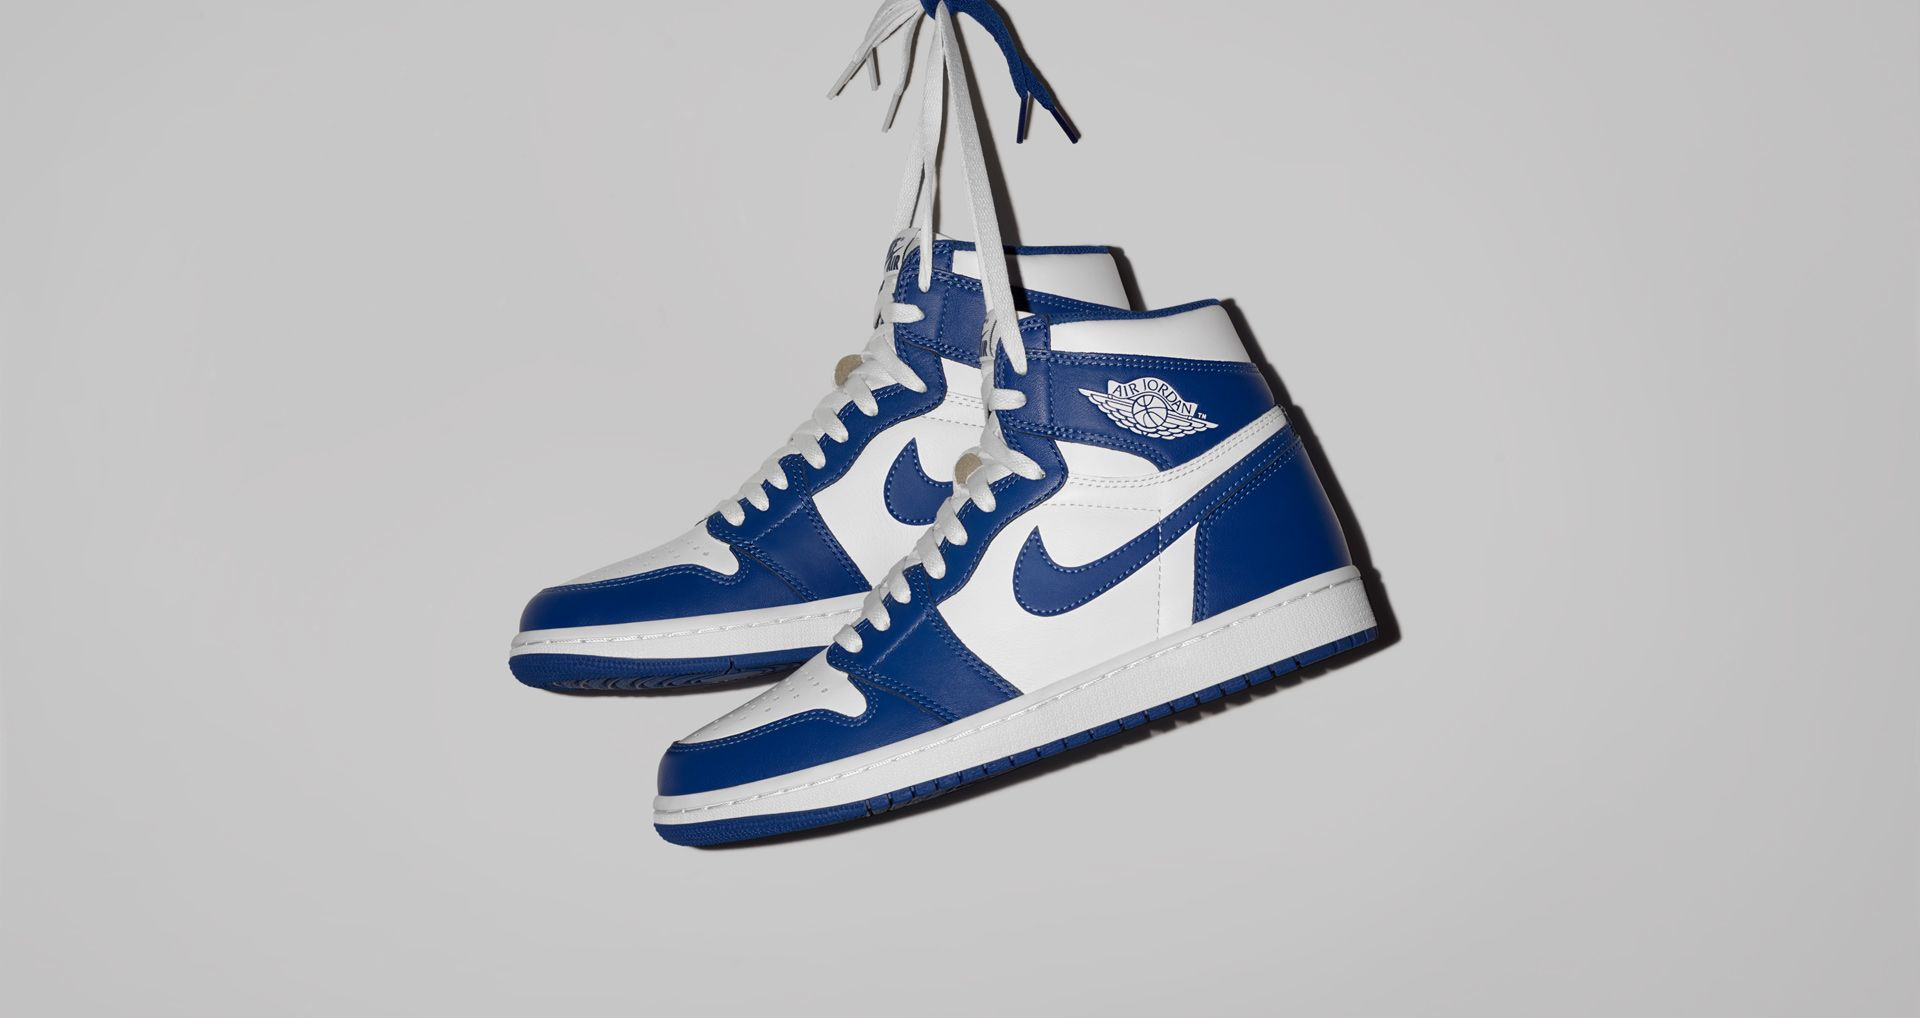 2b77dbb39ac0 Air Jordan 1 Retro  Storm Blue . Nike+ SNKRS